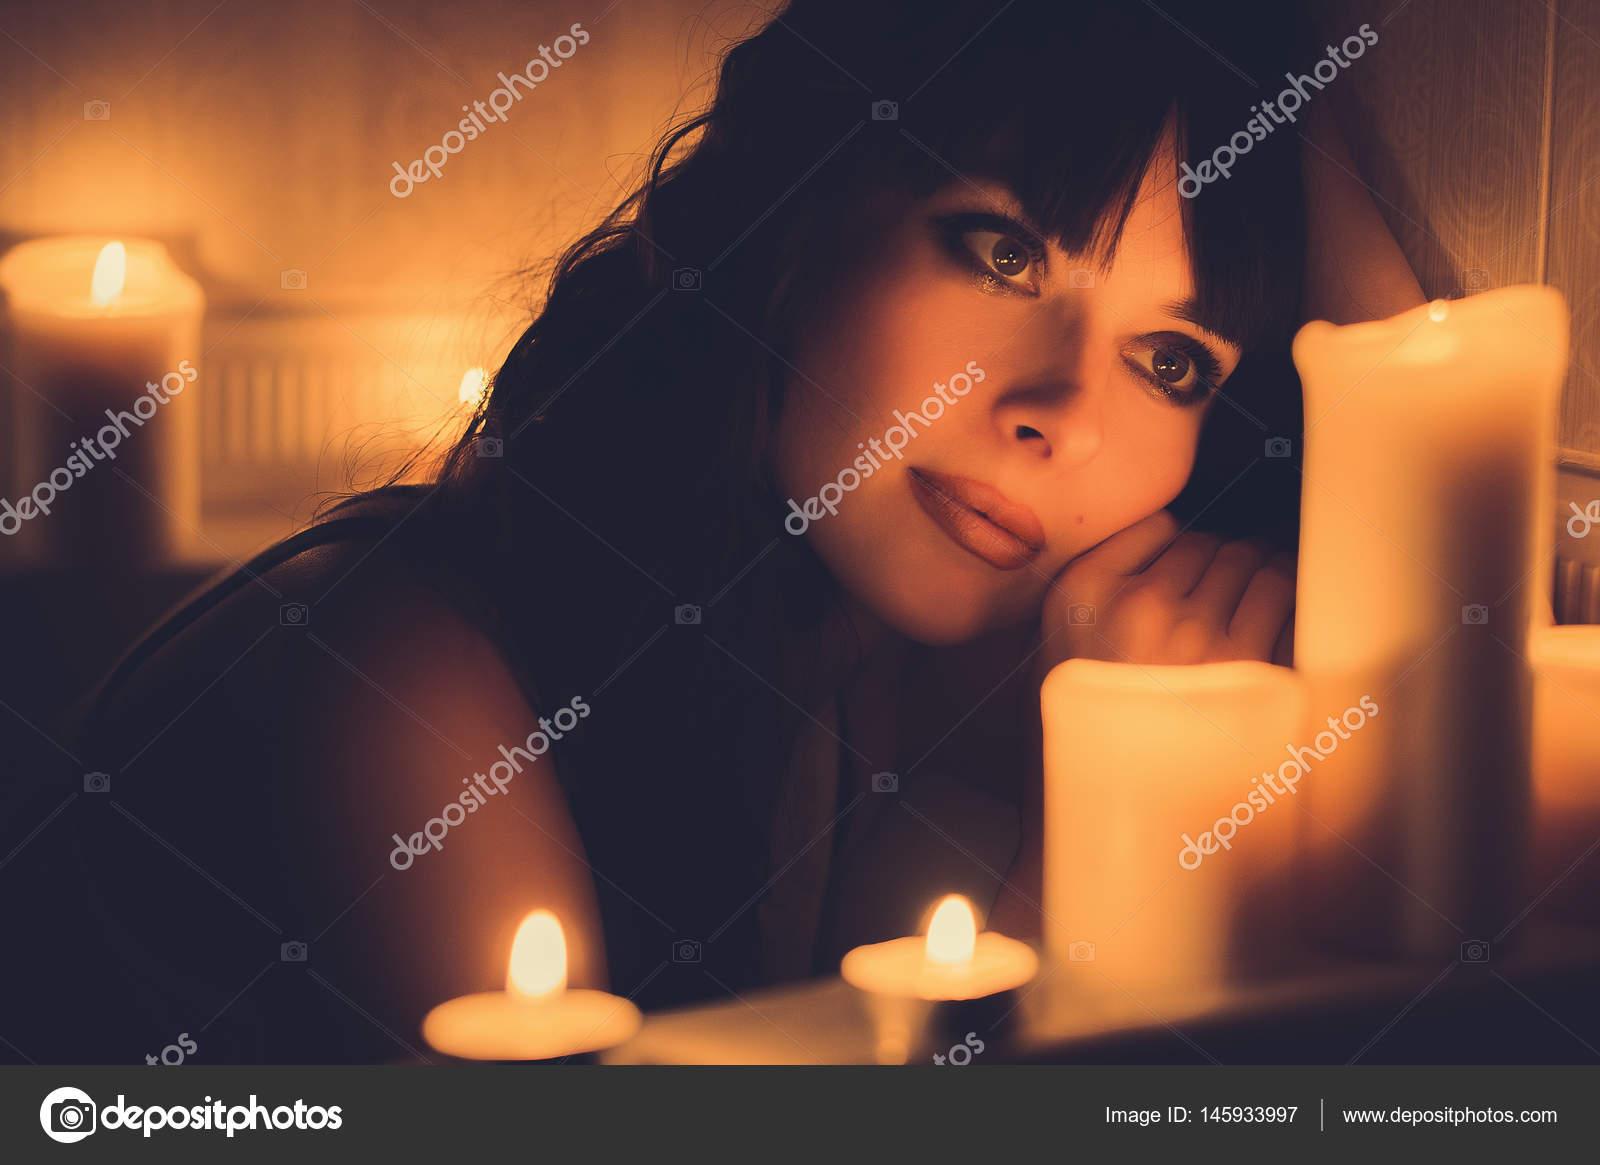 Vasca Da Bagno Romantica Con Candele : Vasca da bagno romantica con candele idee per trasformare il